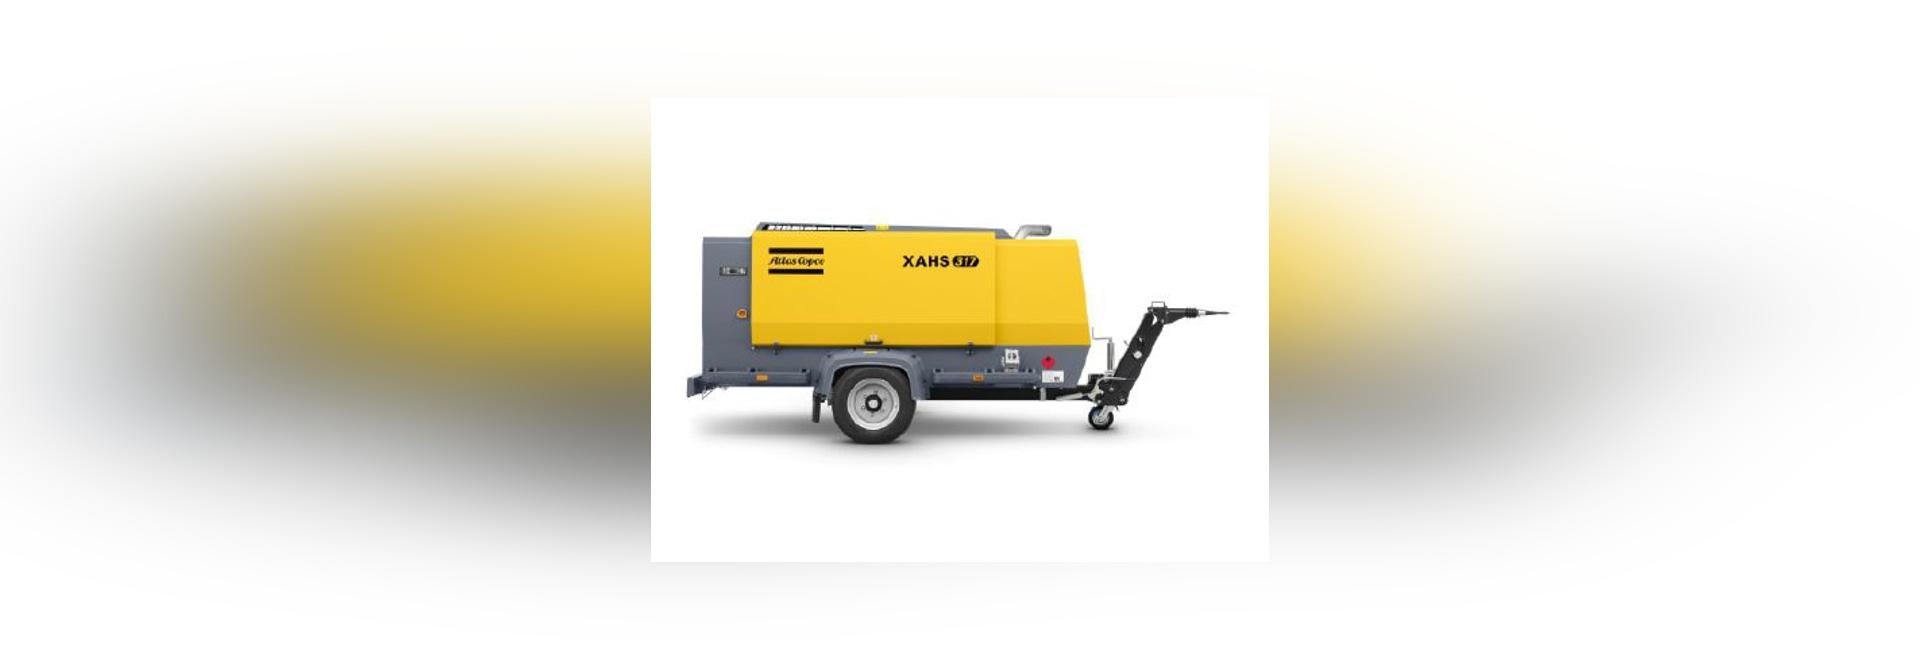 NEW: air compressor by ATLAS Copco Compressors USA